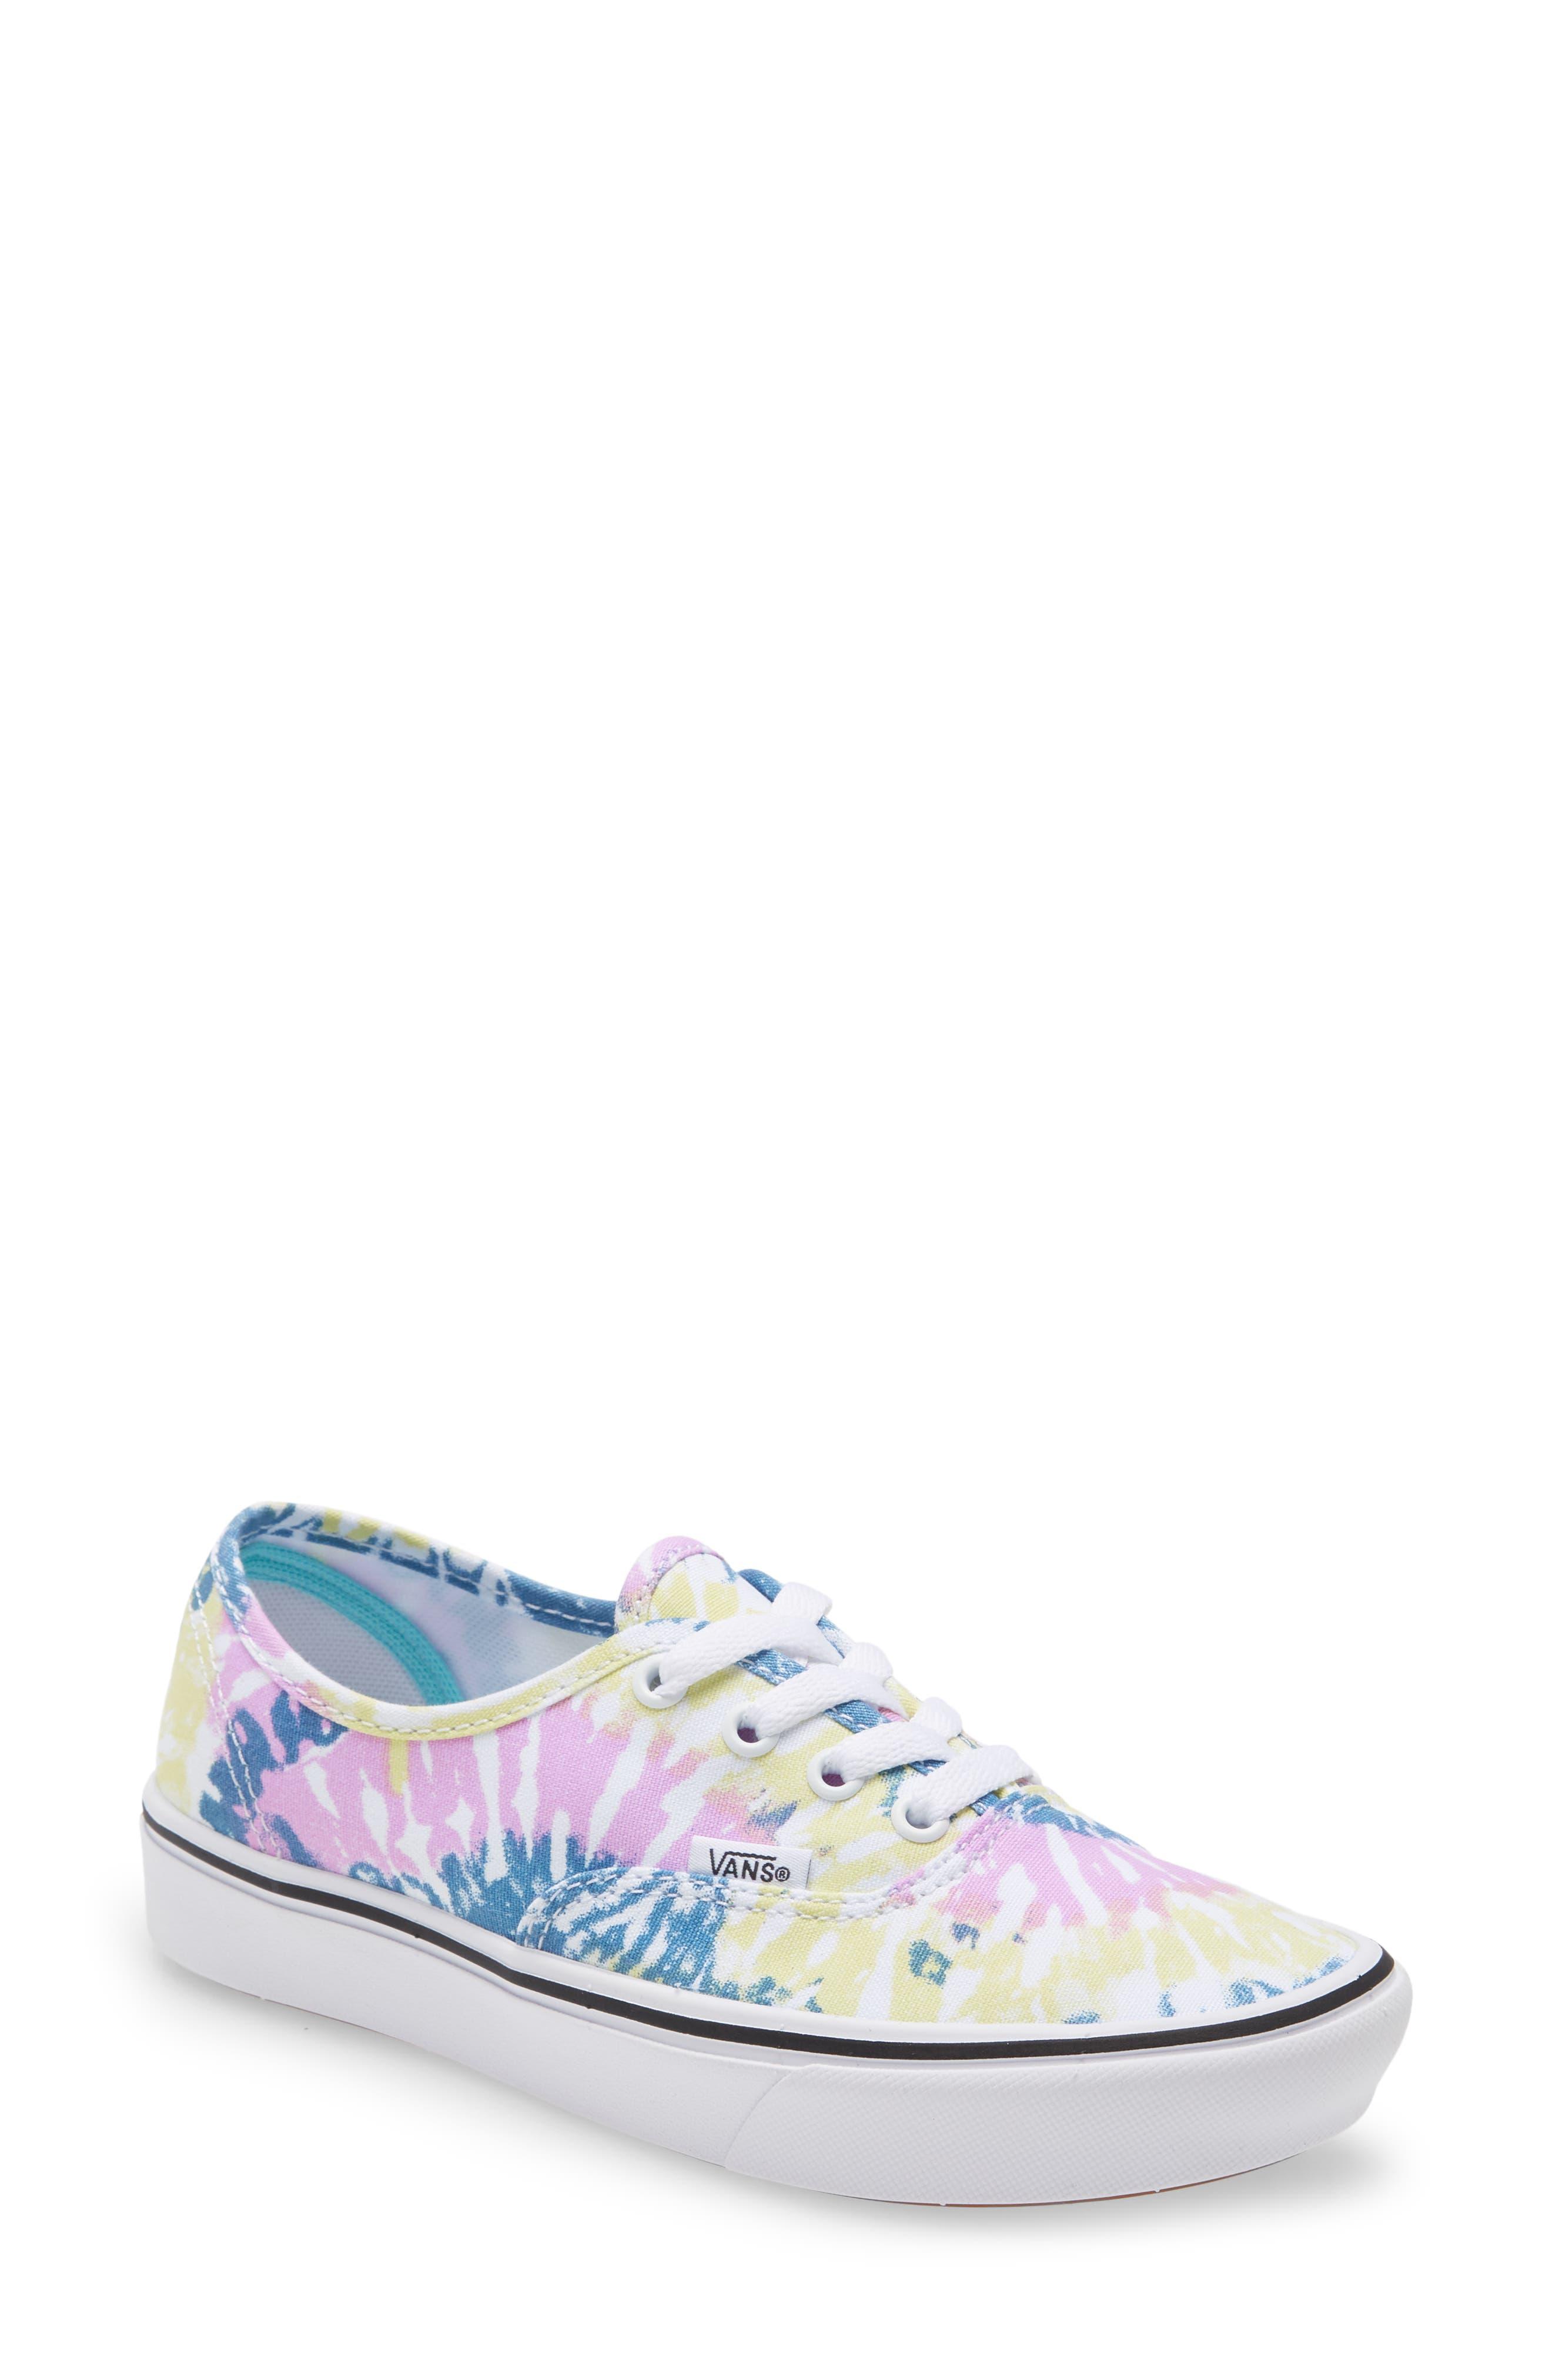 Women's Vans Shoes Sale & Clearance | Nordstrom